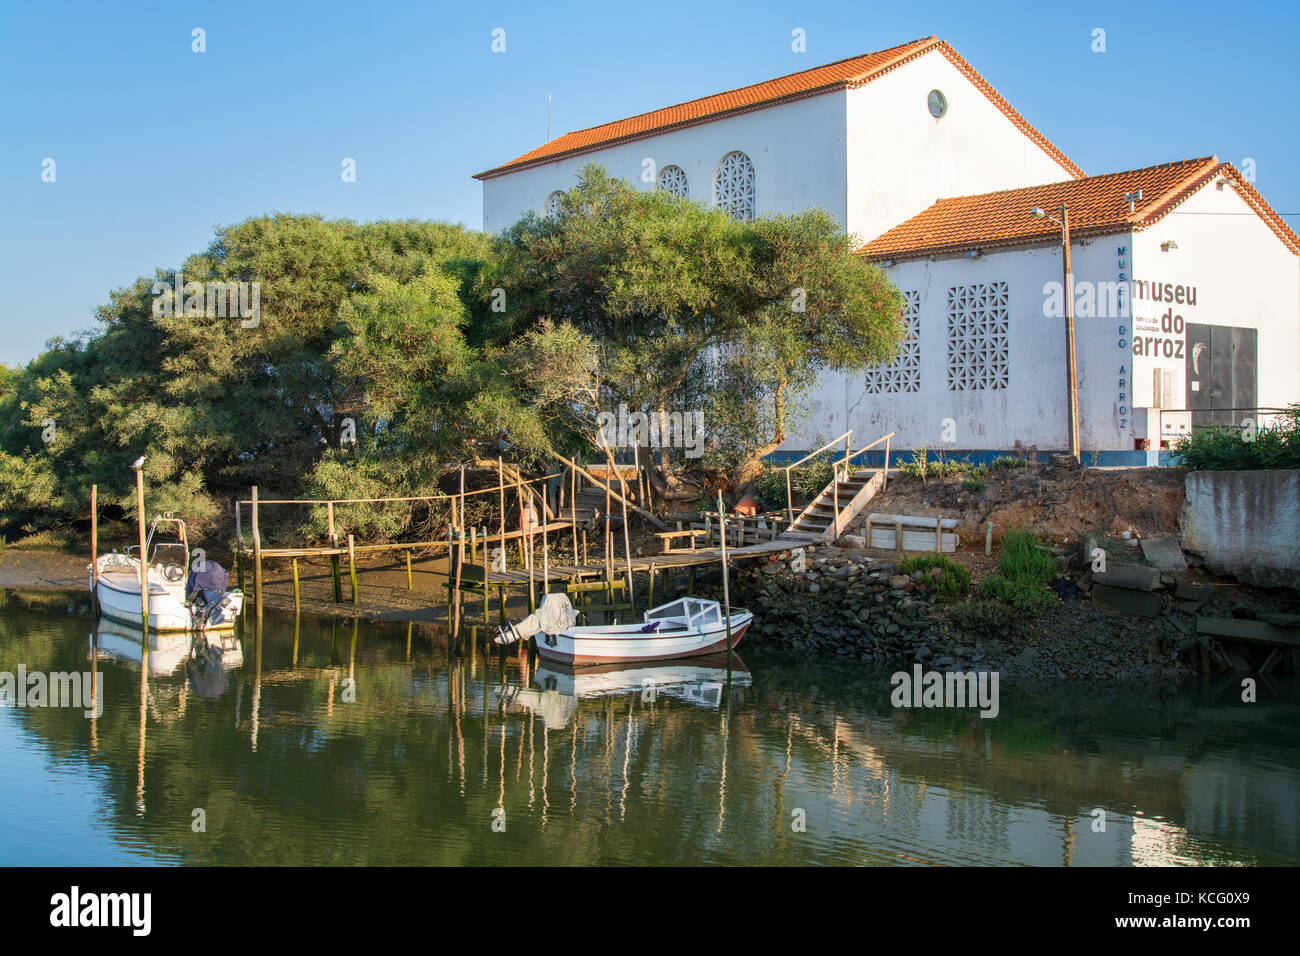 Alentejo Portugal. 06 September 2017.Rice Museum in Comporta Alentejo, Portugal. photography by Ricardo Rocha. - Stock Image